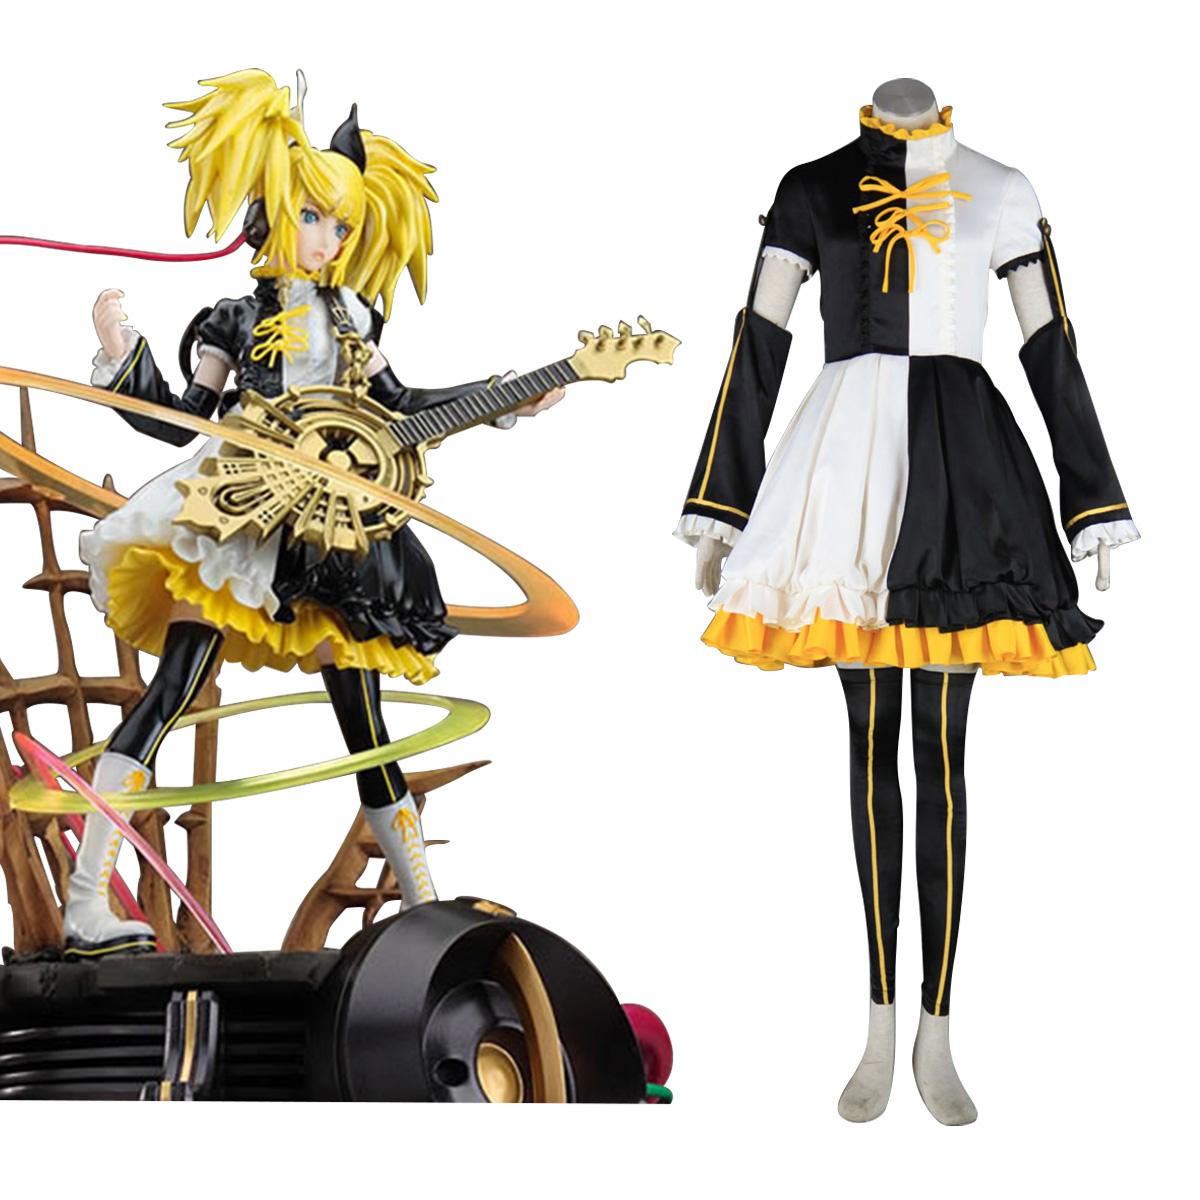 Fantasias Vocaloid Kagamine Rin & Len 1 Trajes Cosplay